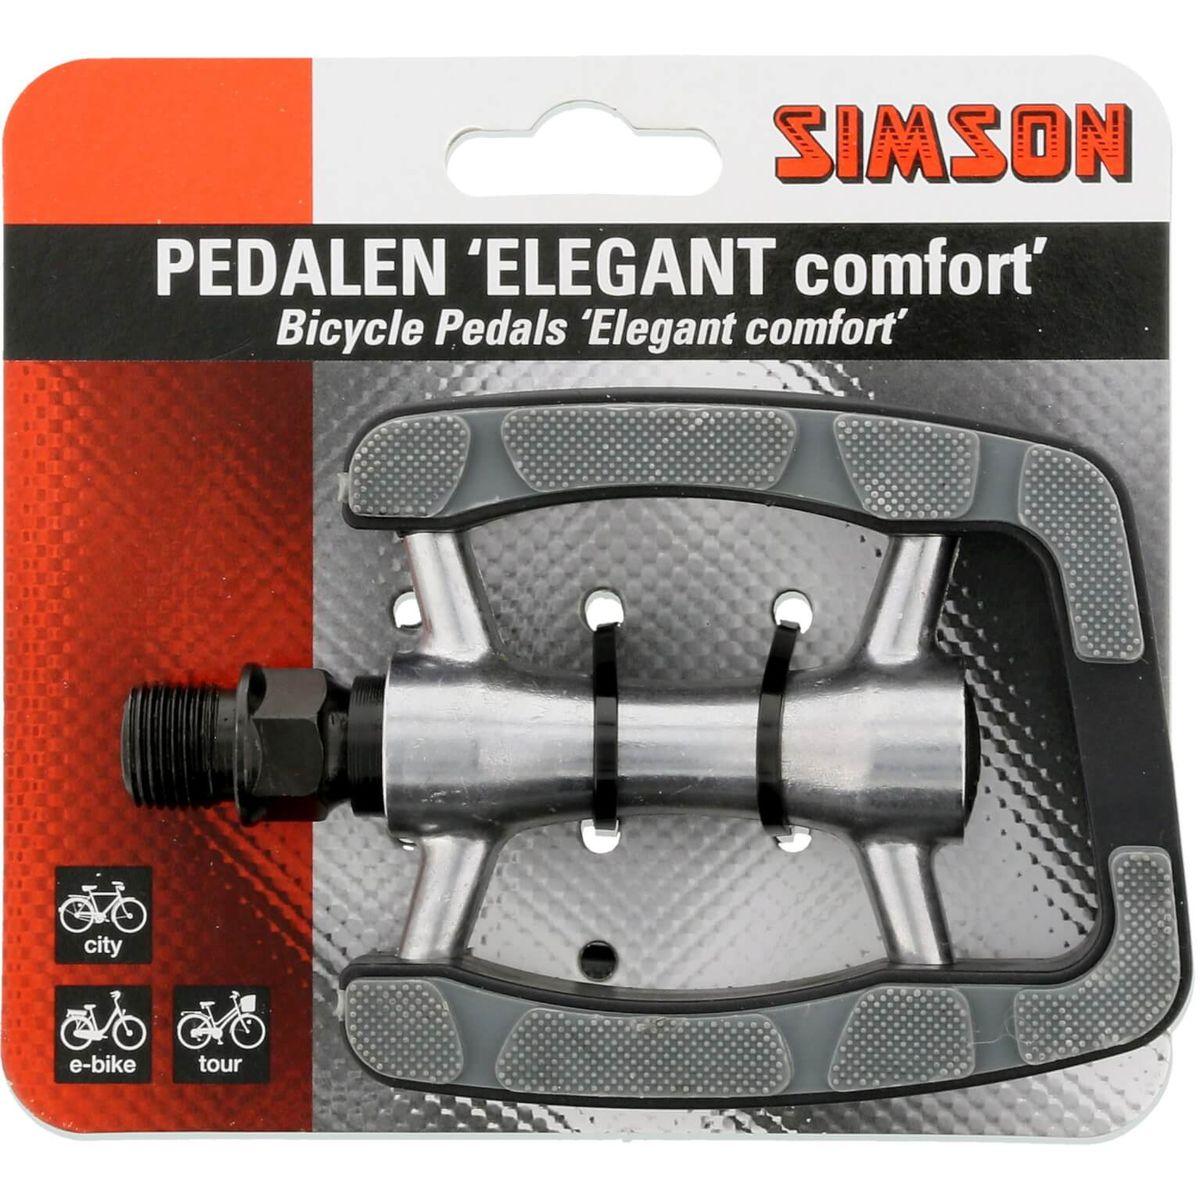 Simson pedaalset elegant comfort reflectoren (2)